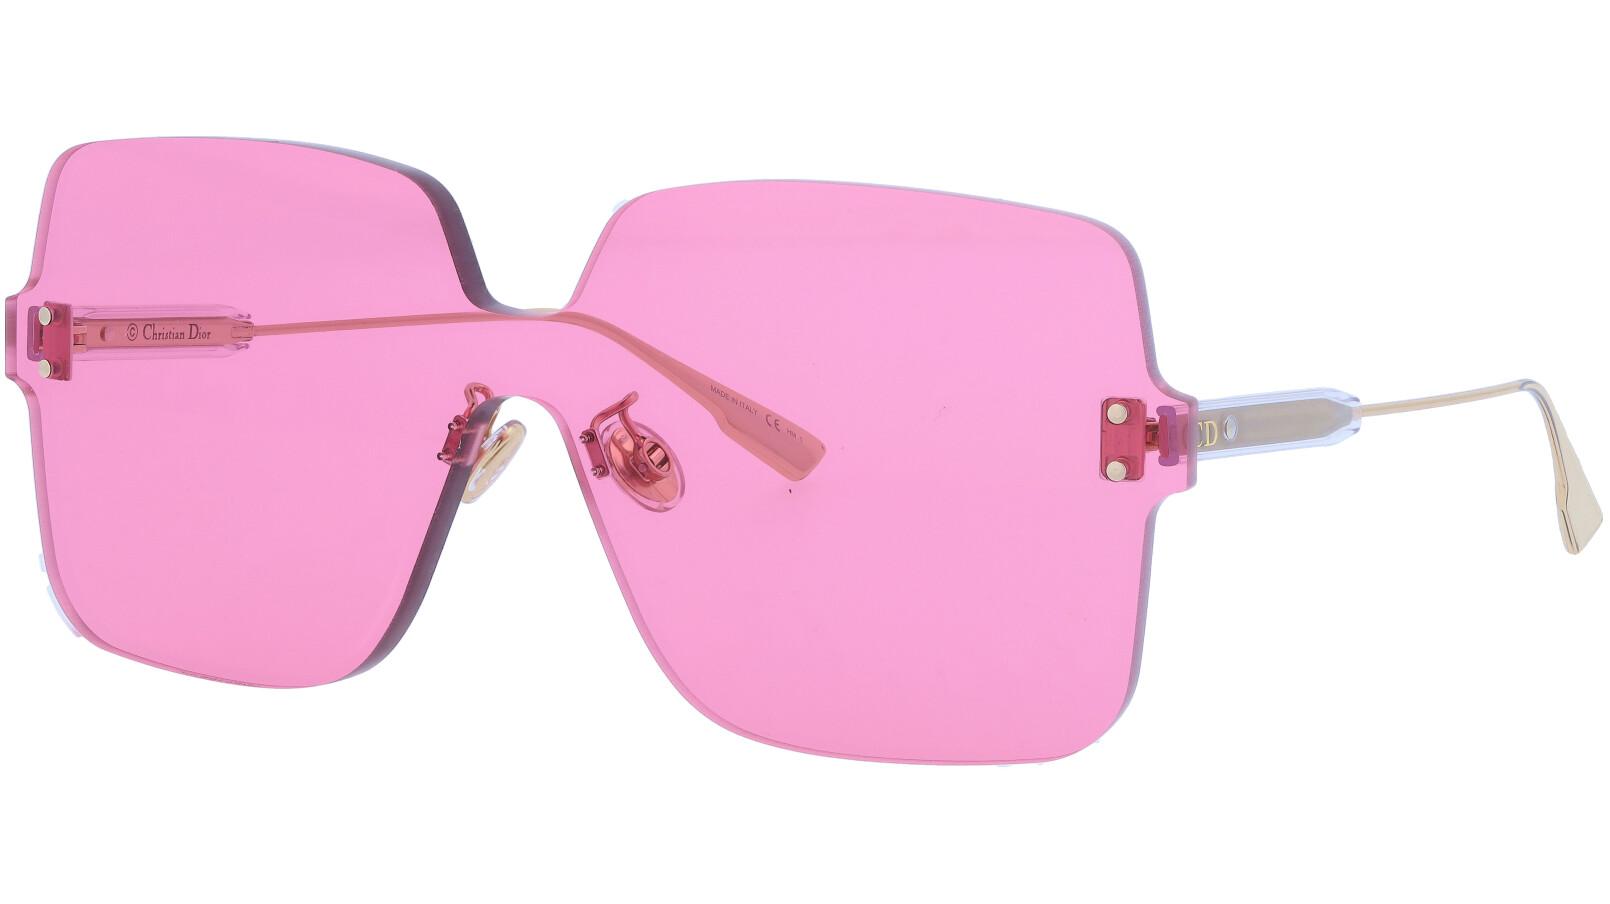 DIOR DIORCOLORQUAKE1 DDBSQ 99 GOLD Sunglasses